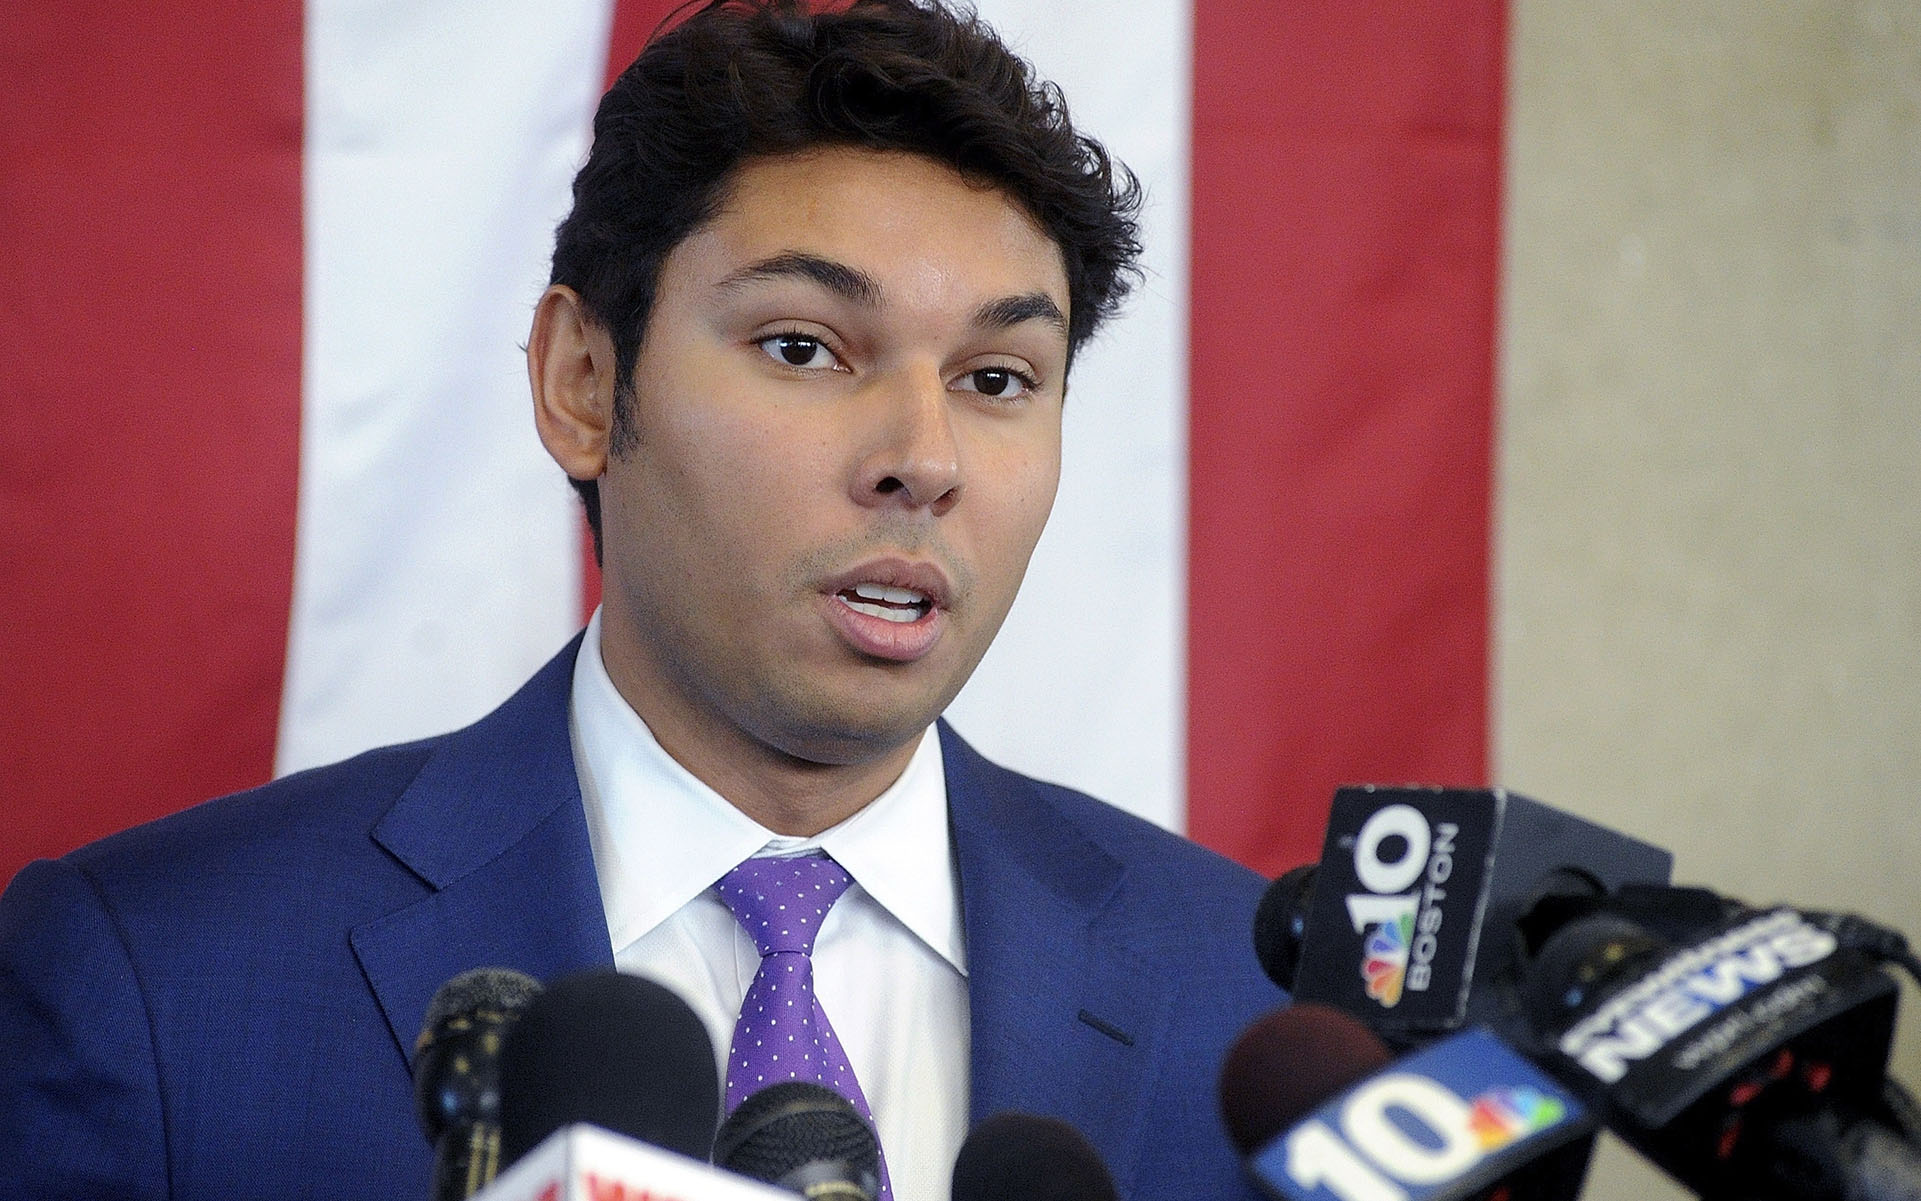 Mayor Jasiel Correia arrested over cannabis licensing bribes